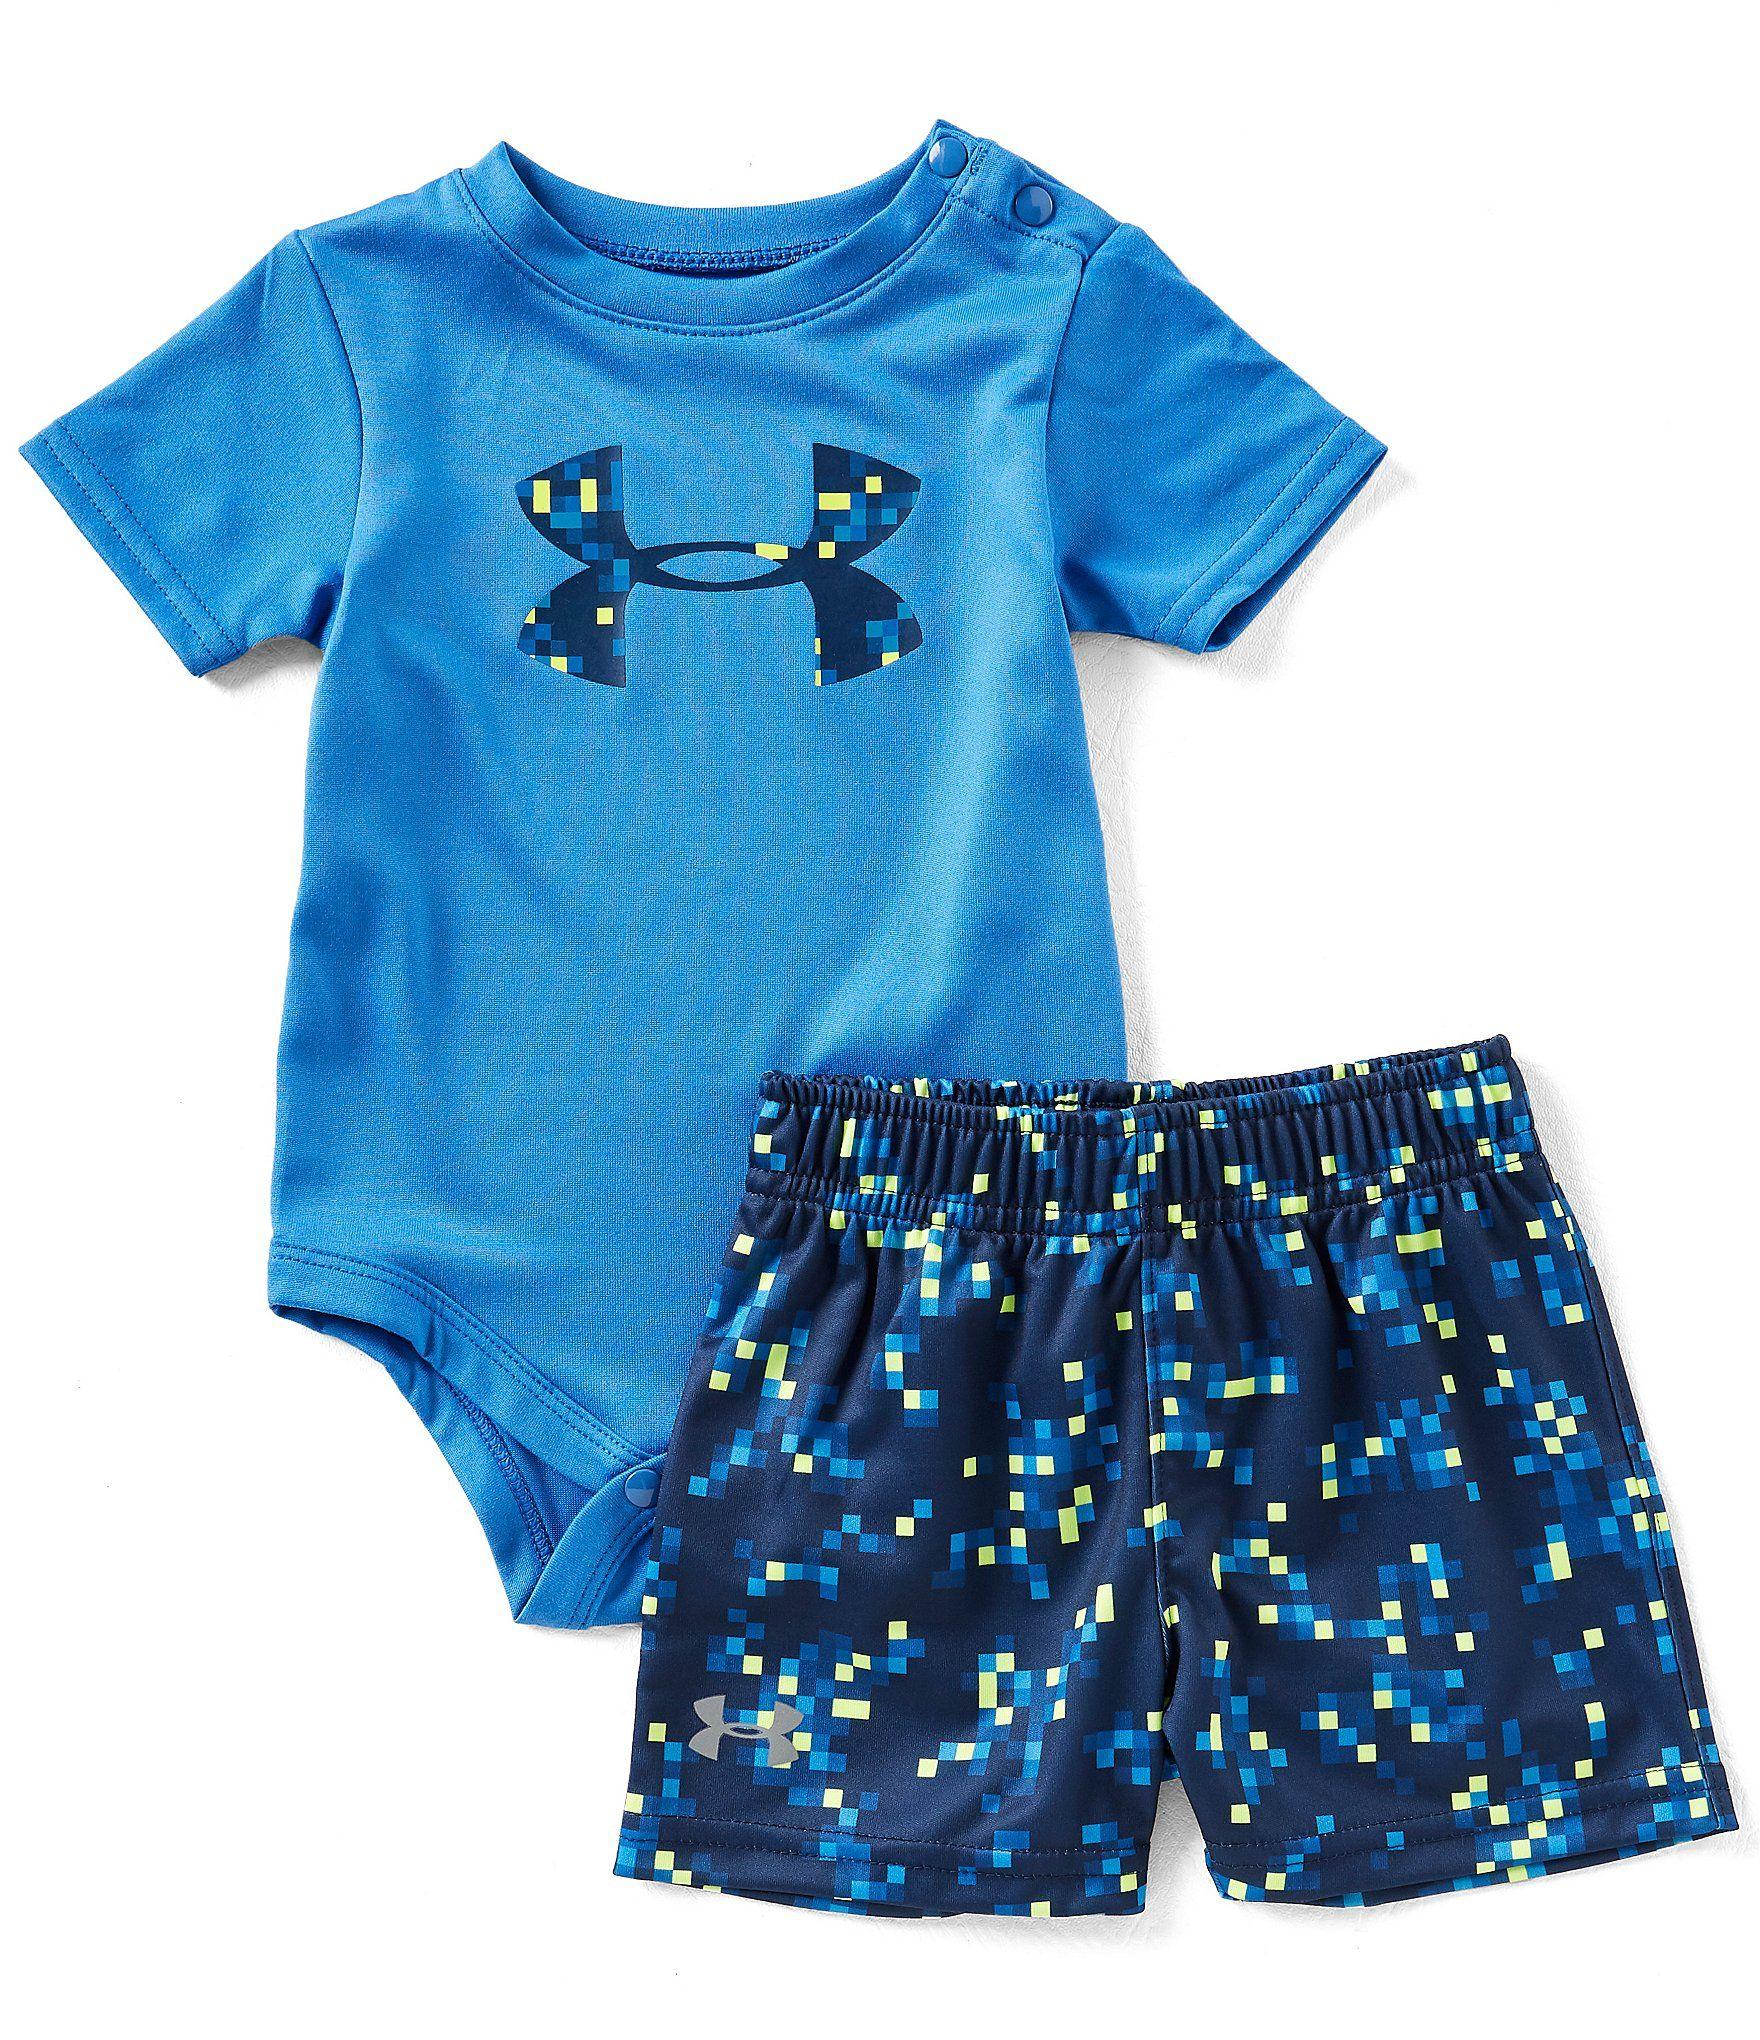 2133e3b58 Shop for Under Armour Baby Boys Newborn-24 Months Digi Camouflage ...